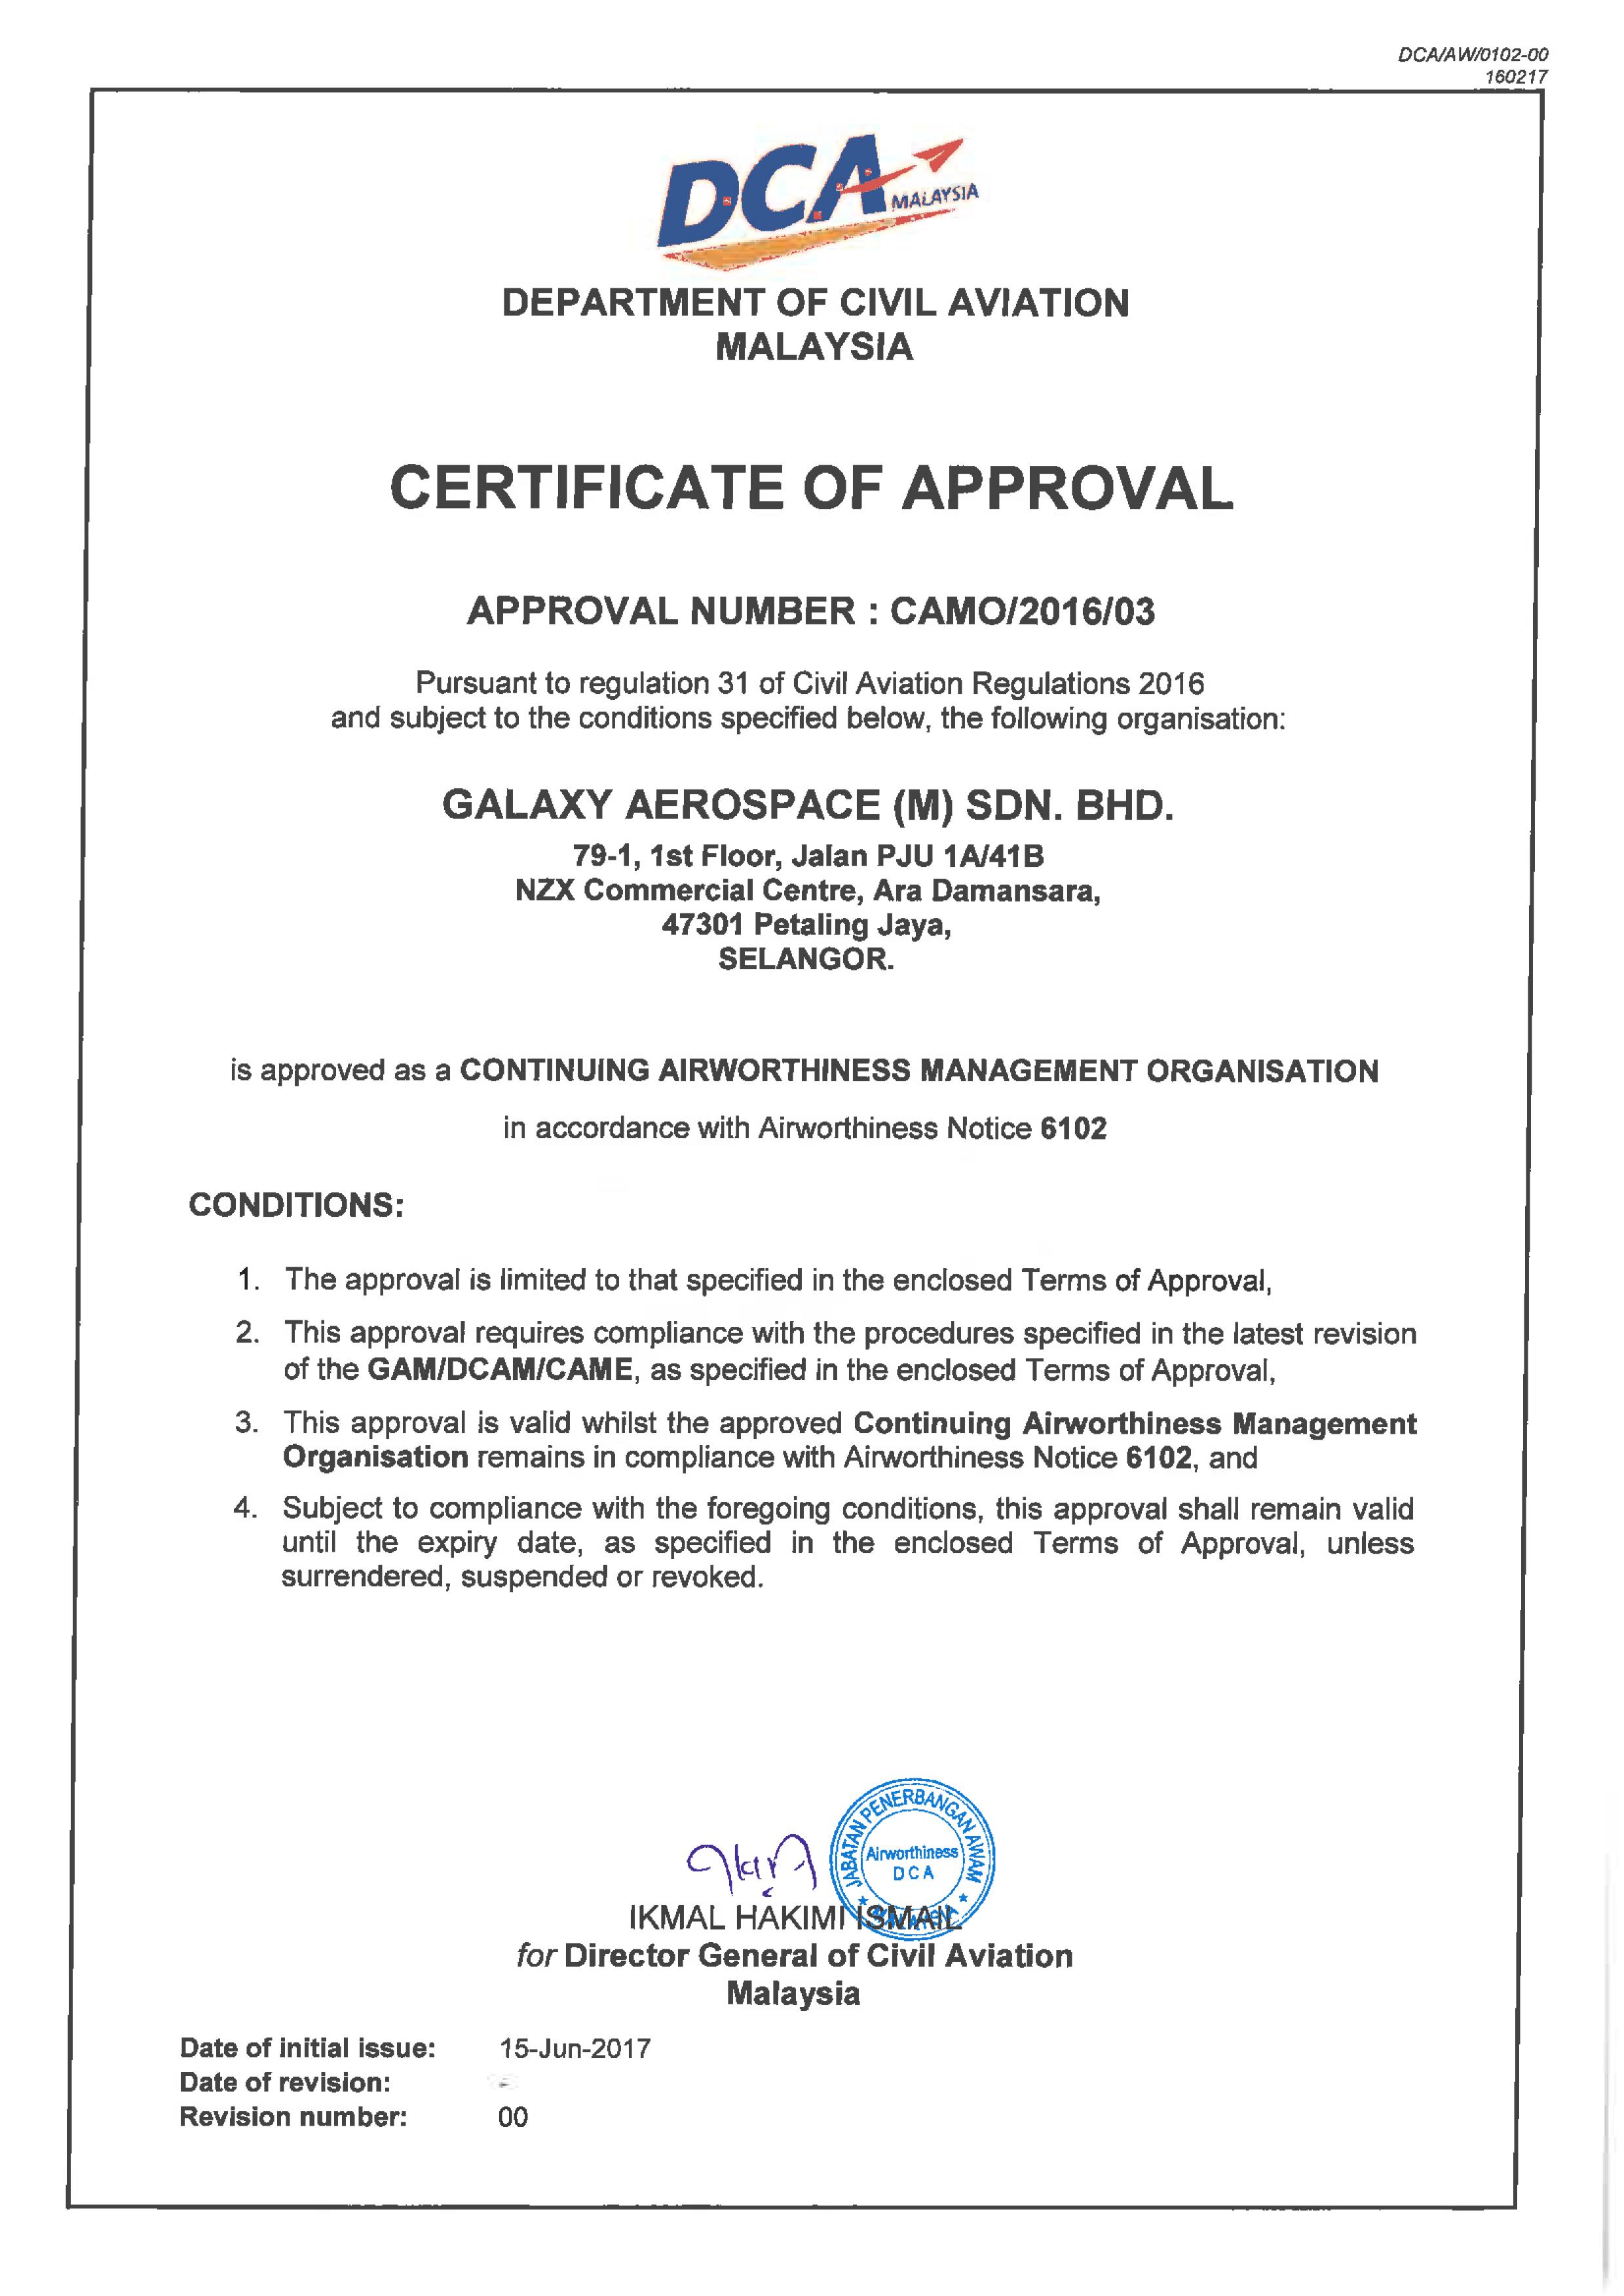 Approval Amp Capabilities Galaxy Aerospace M Sdn Bhd